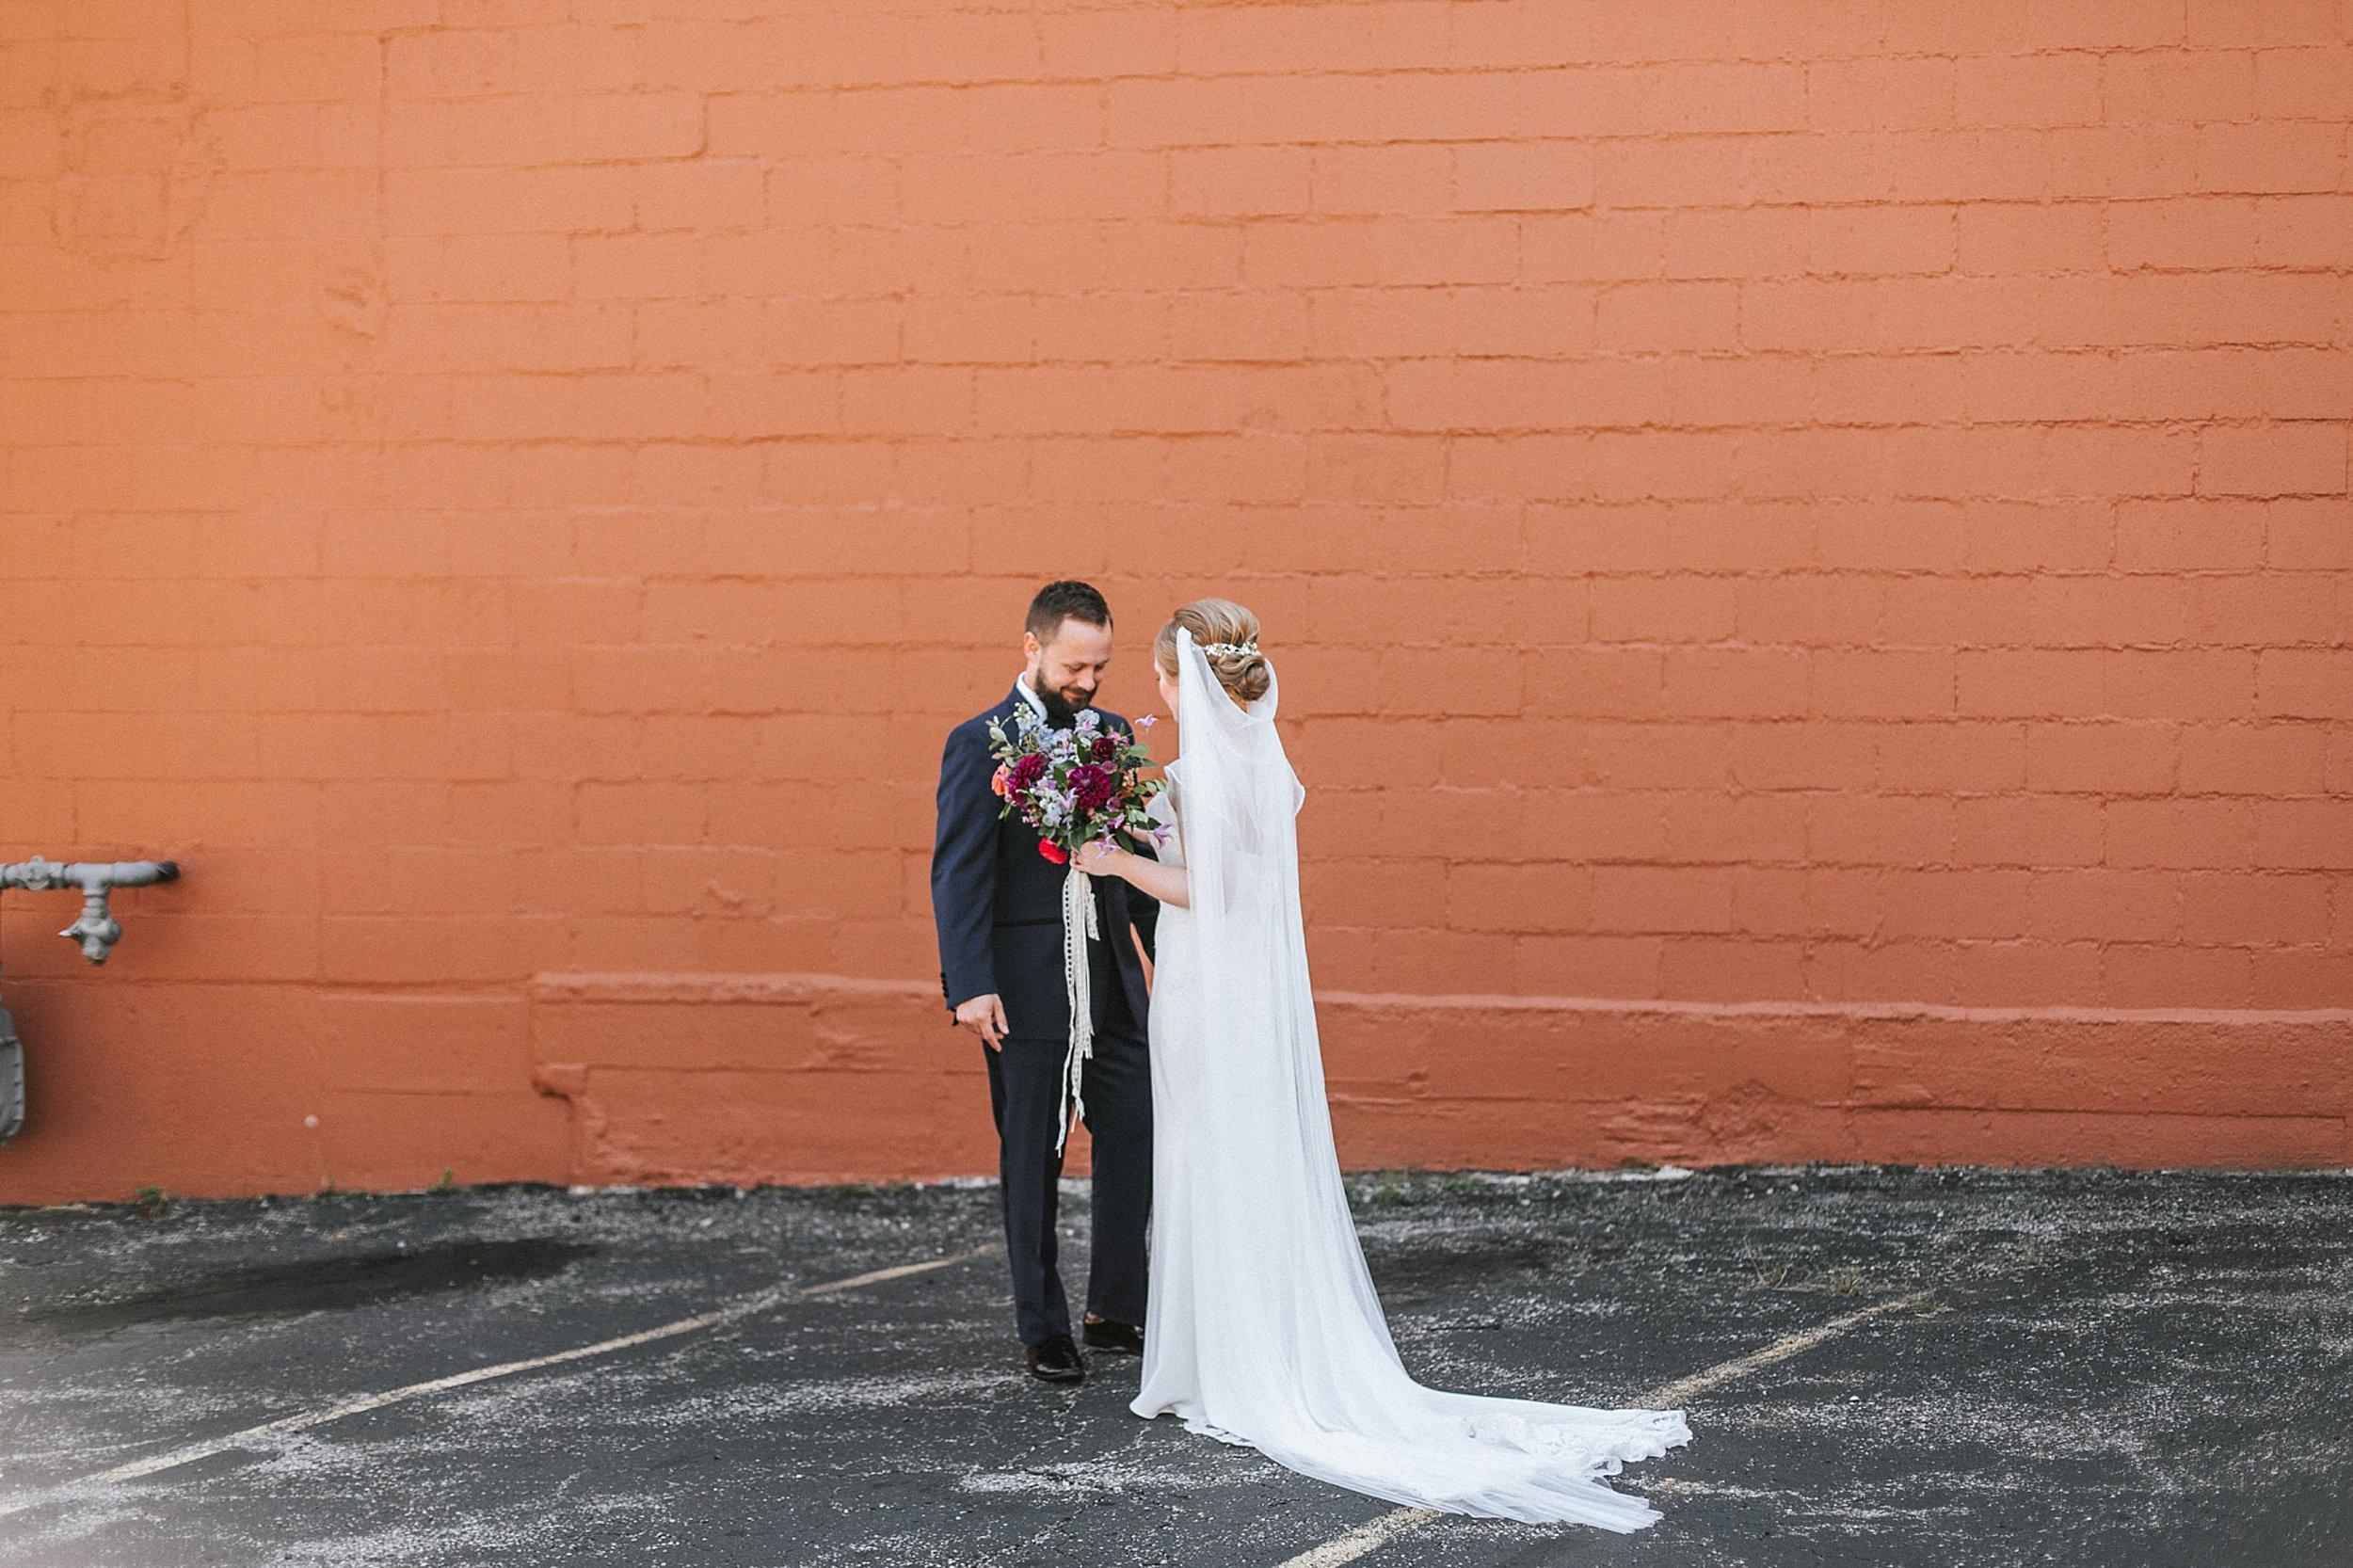 Brooke Townsend Photography - Ohio Wedding Photographer-48.jpg